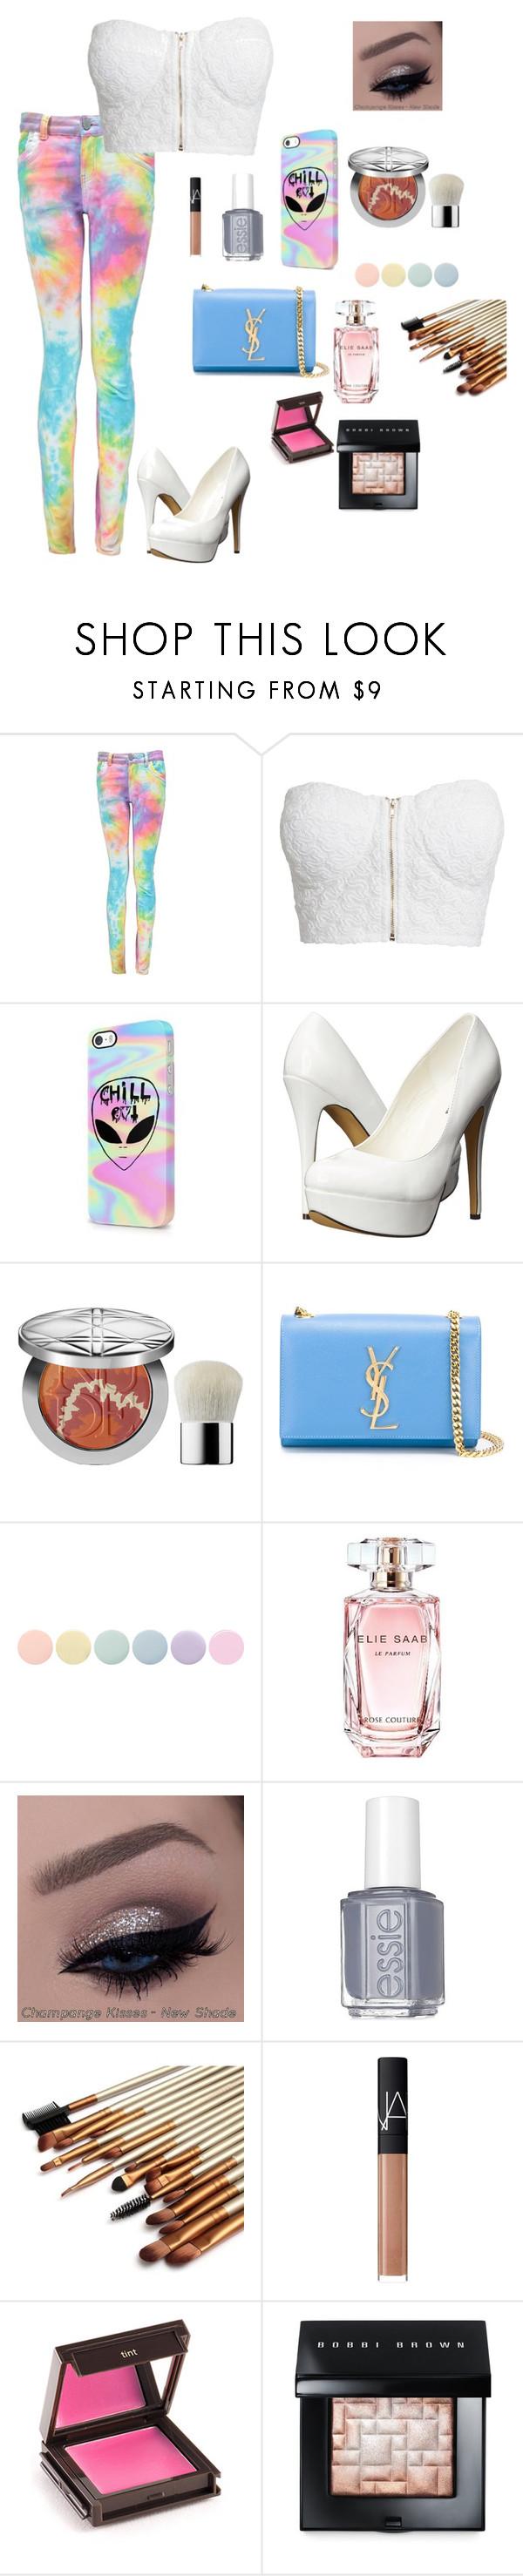 """Tye dye"" by dancegirl2006 ❤ liked on Polyvore featuring NLY Trend, Michael Antonio, Christian Dior, Yves Saint Laurent, Deborah Lippmann, Elie Saab, Essie, NARS Cosmetics, Jouer and Bobbi Brown Cosmetics"